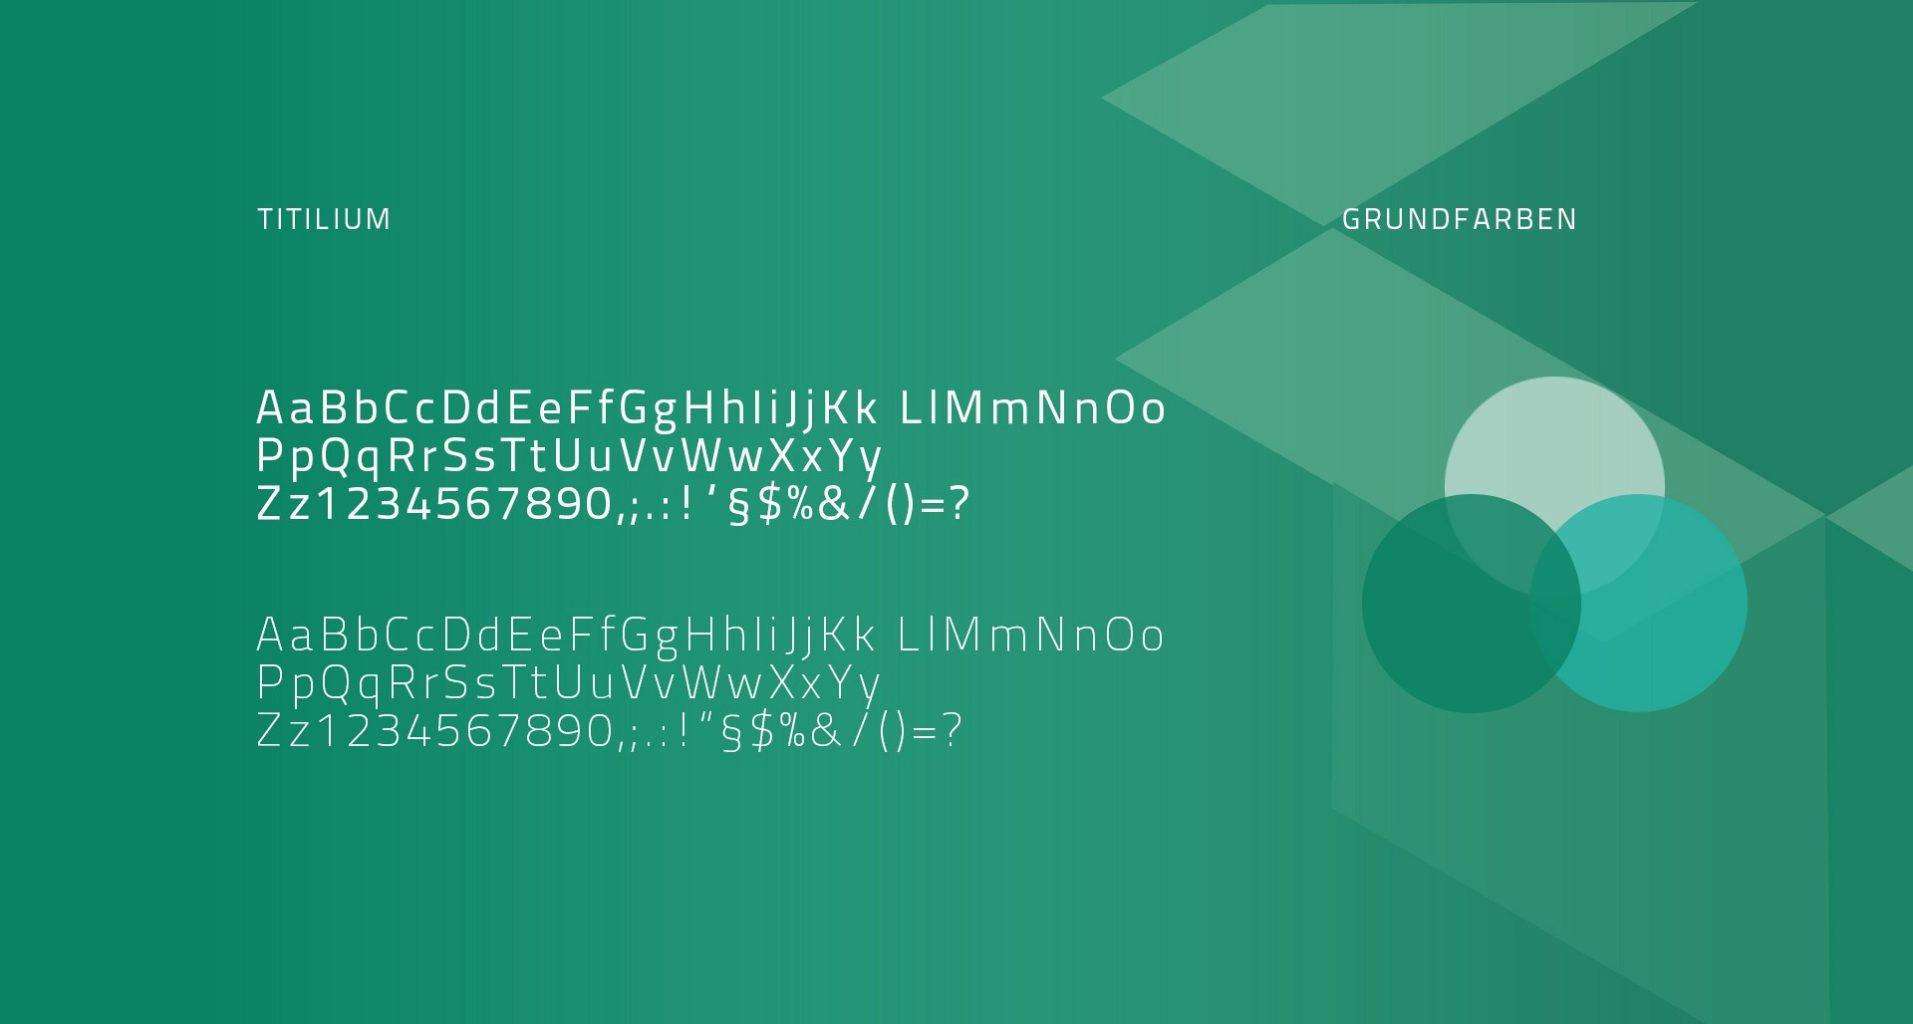 Lufapak-fullfillment-dienstleister-referenz-pictibe-6